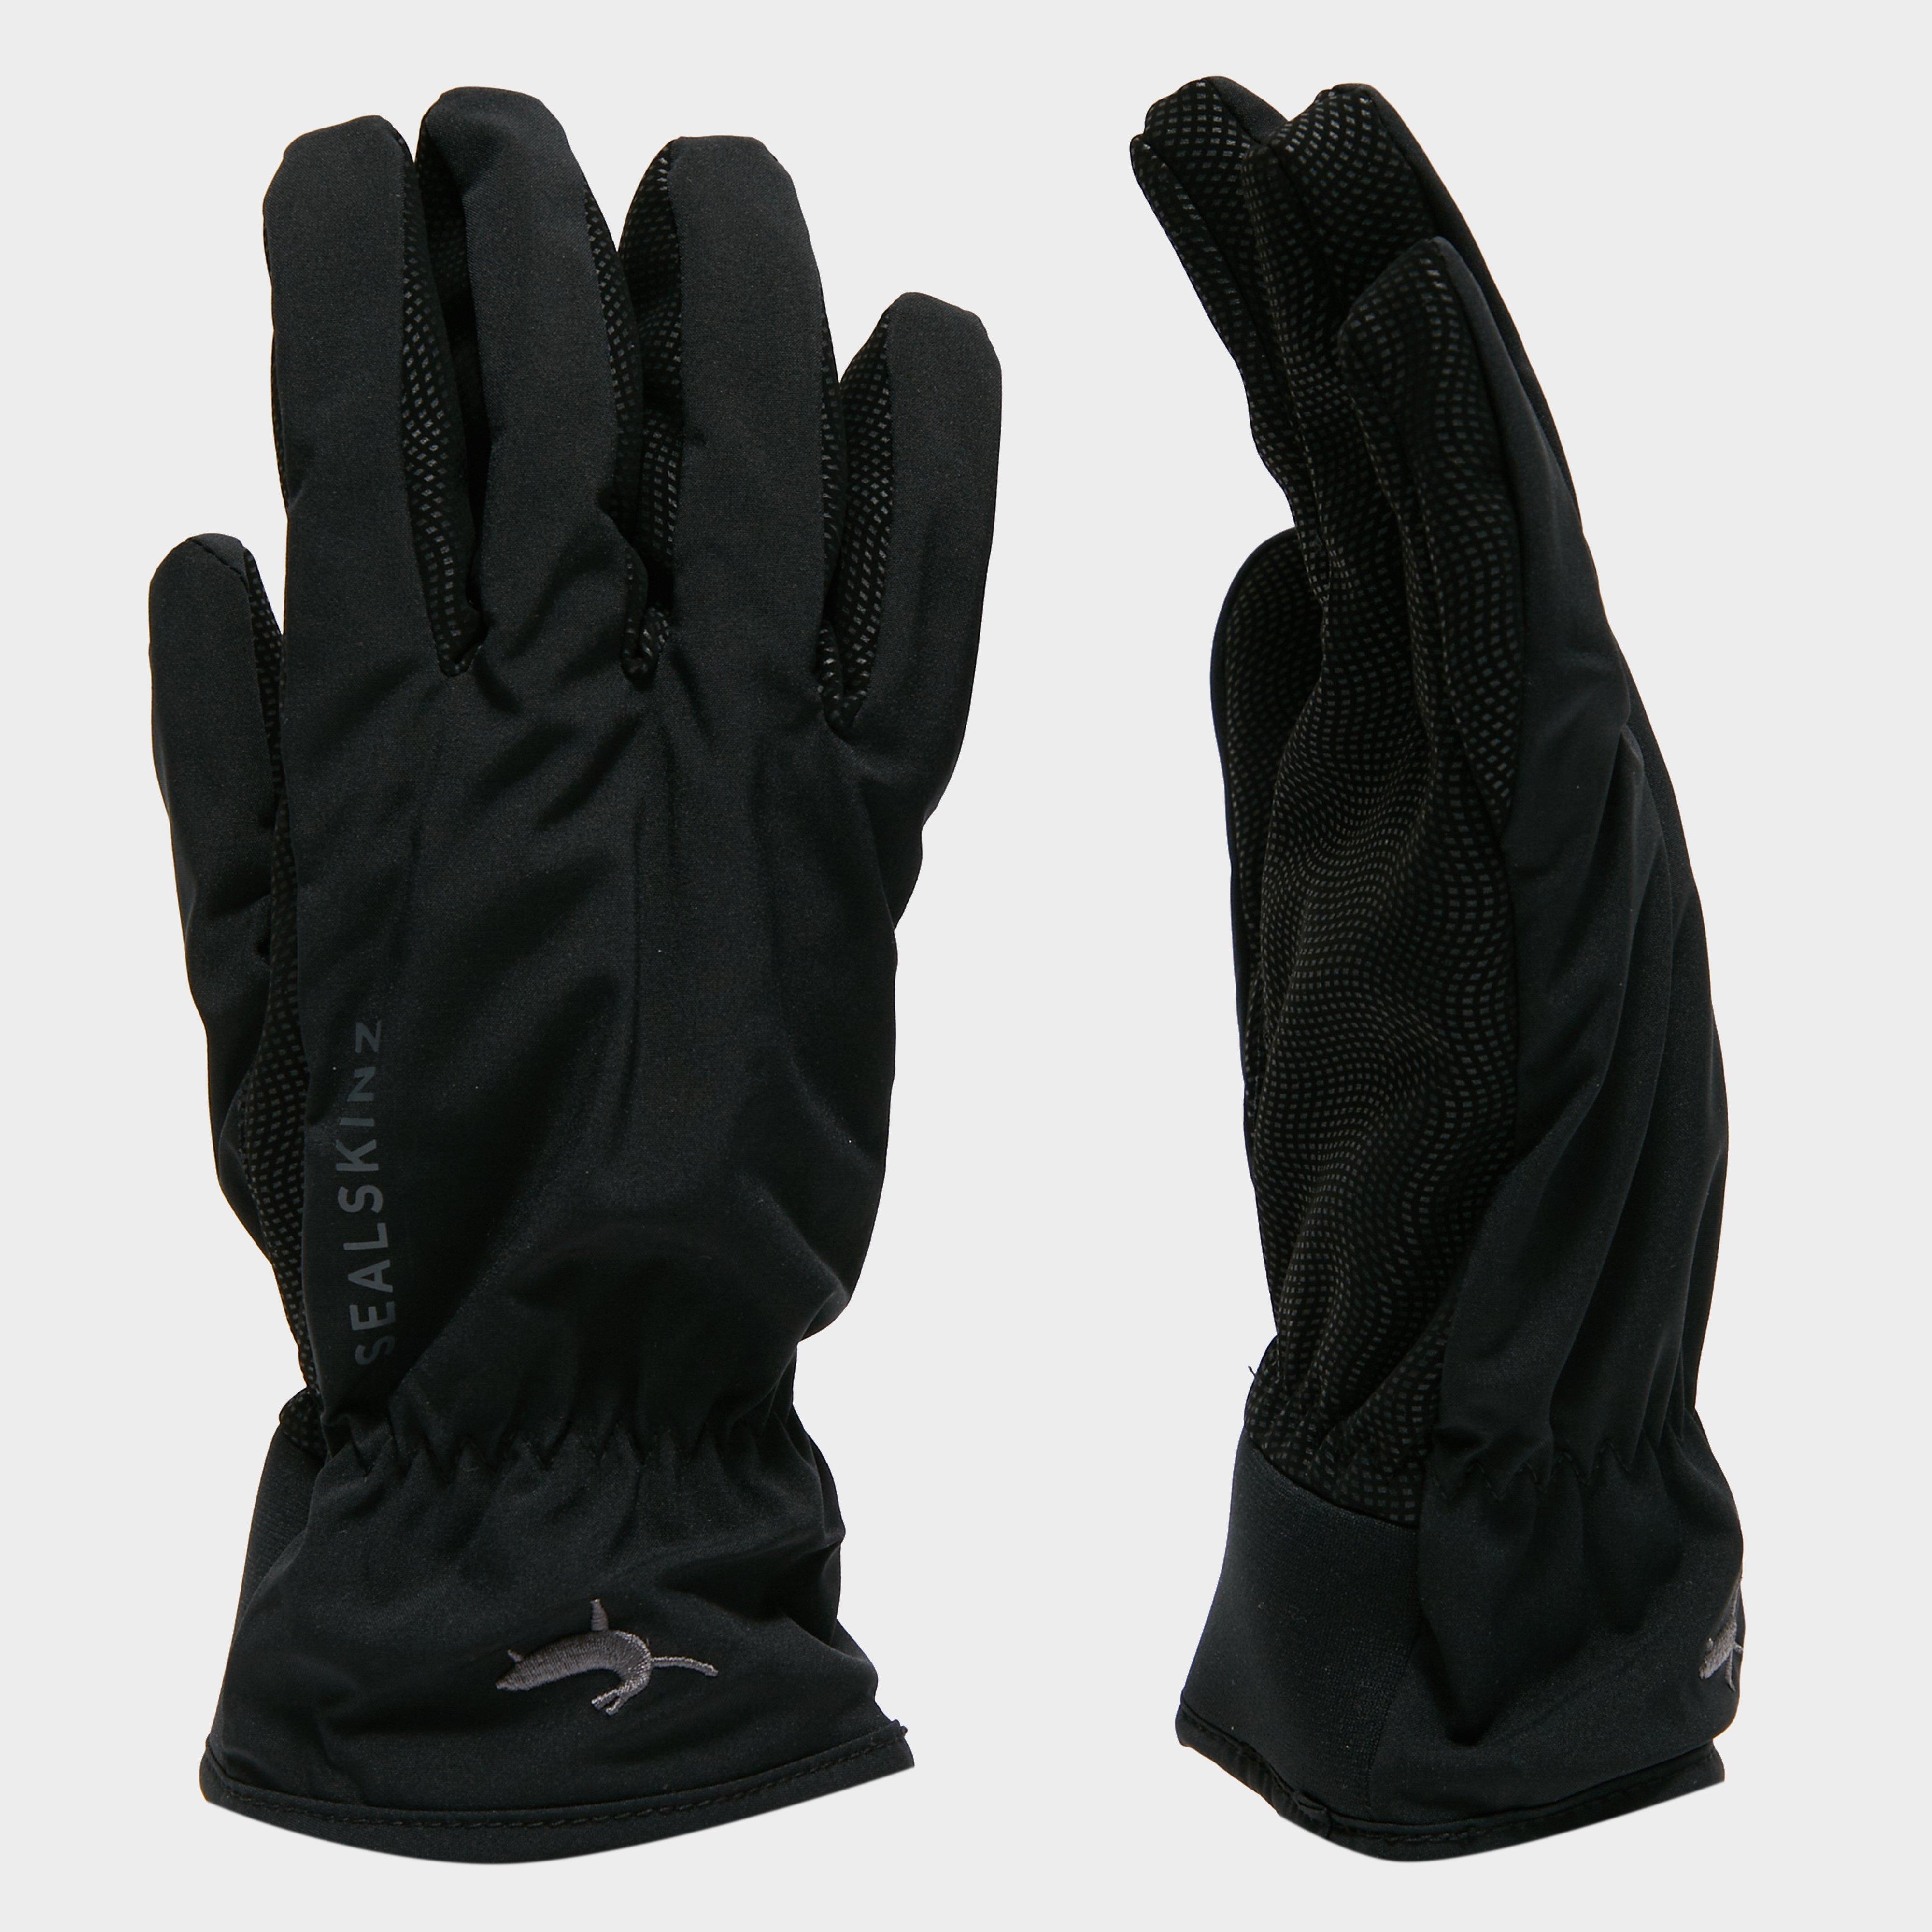 Sealskinz Men's Waterproof All Weather Lightweight Glove - Black/Glv, Black